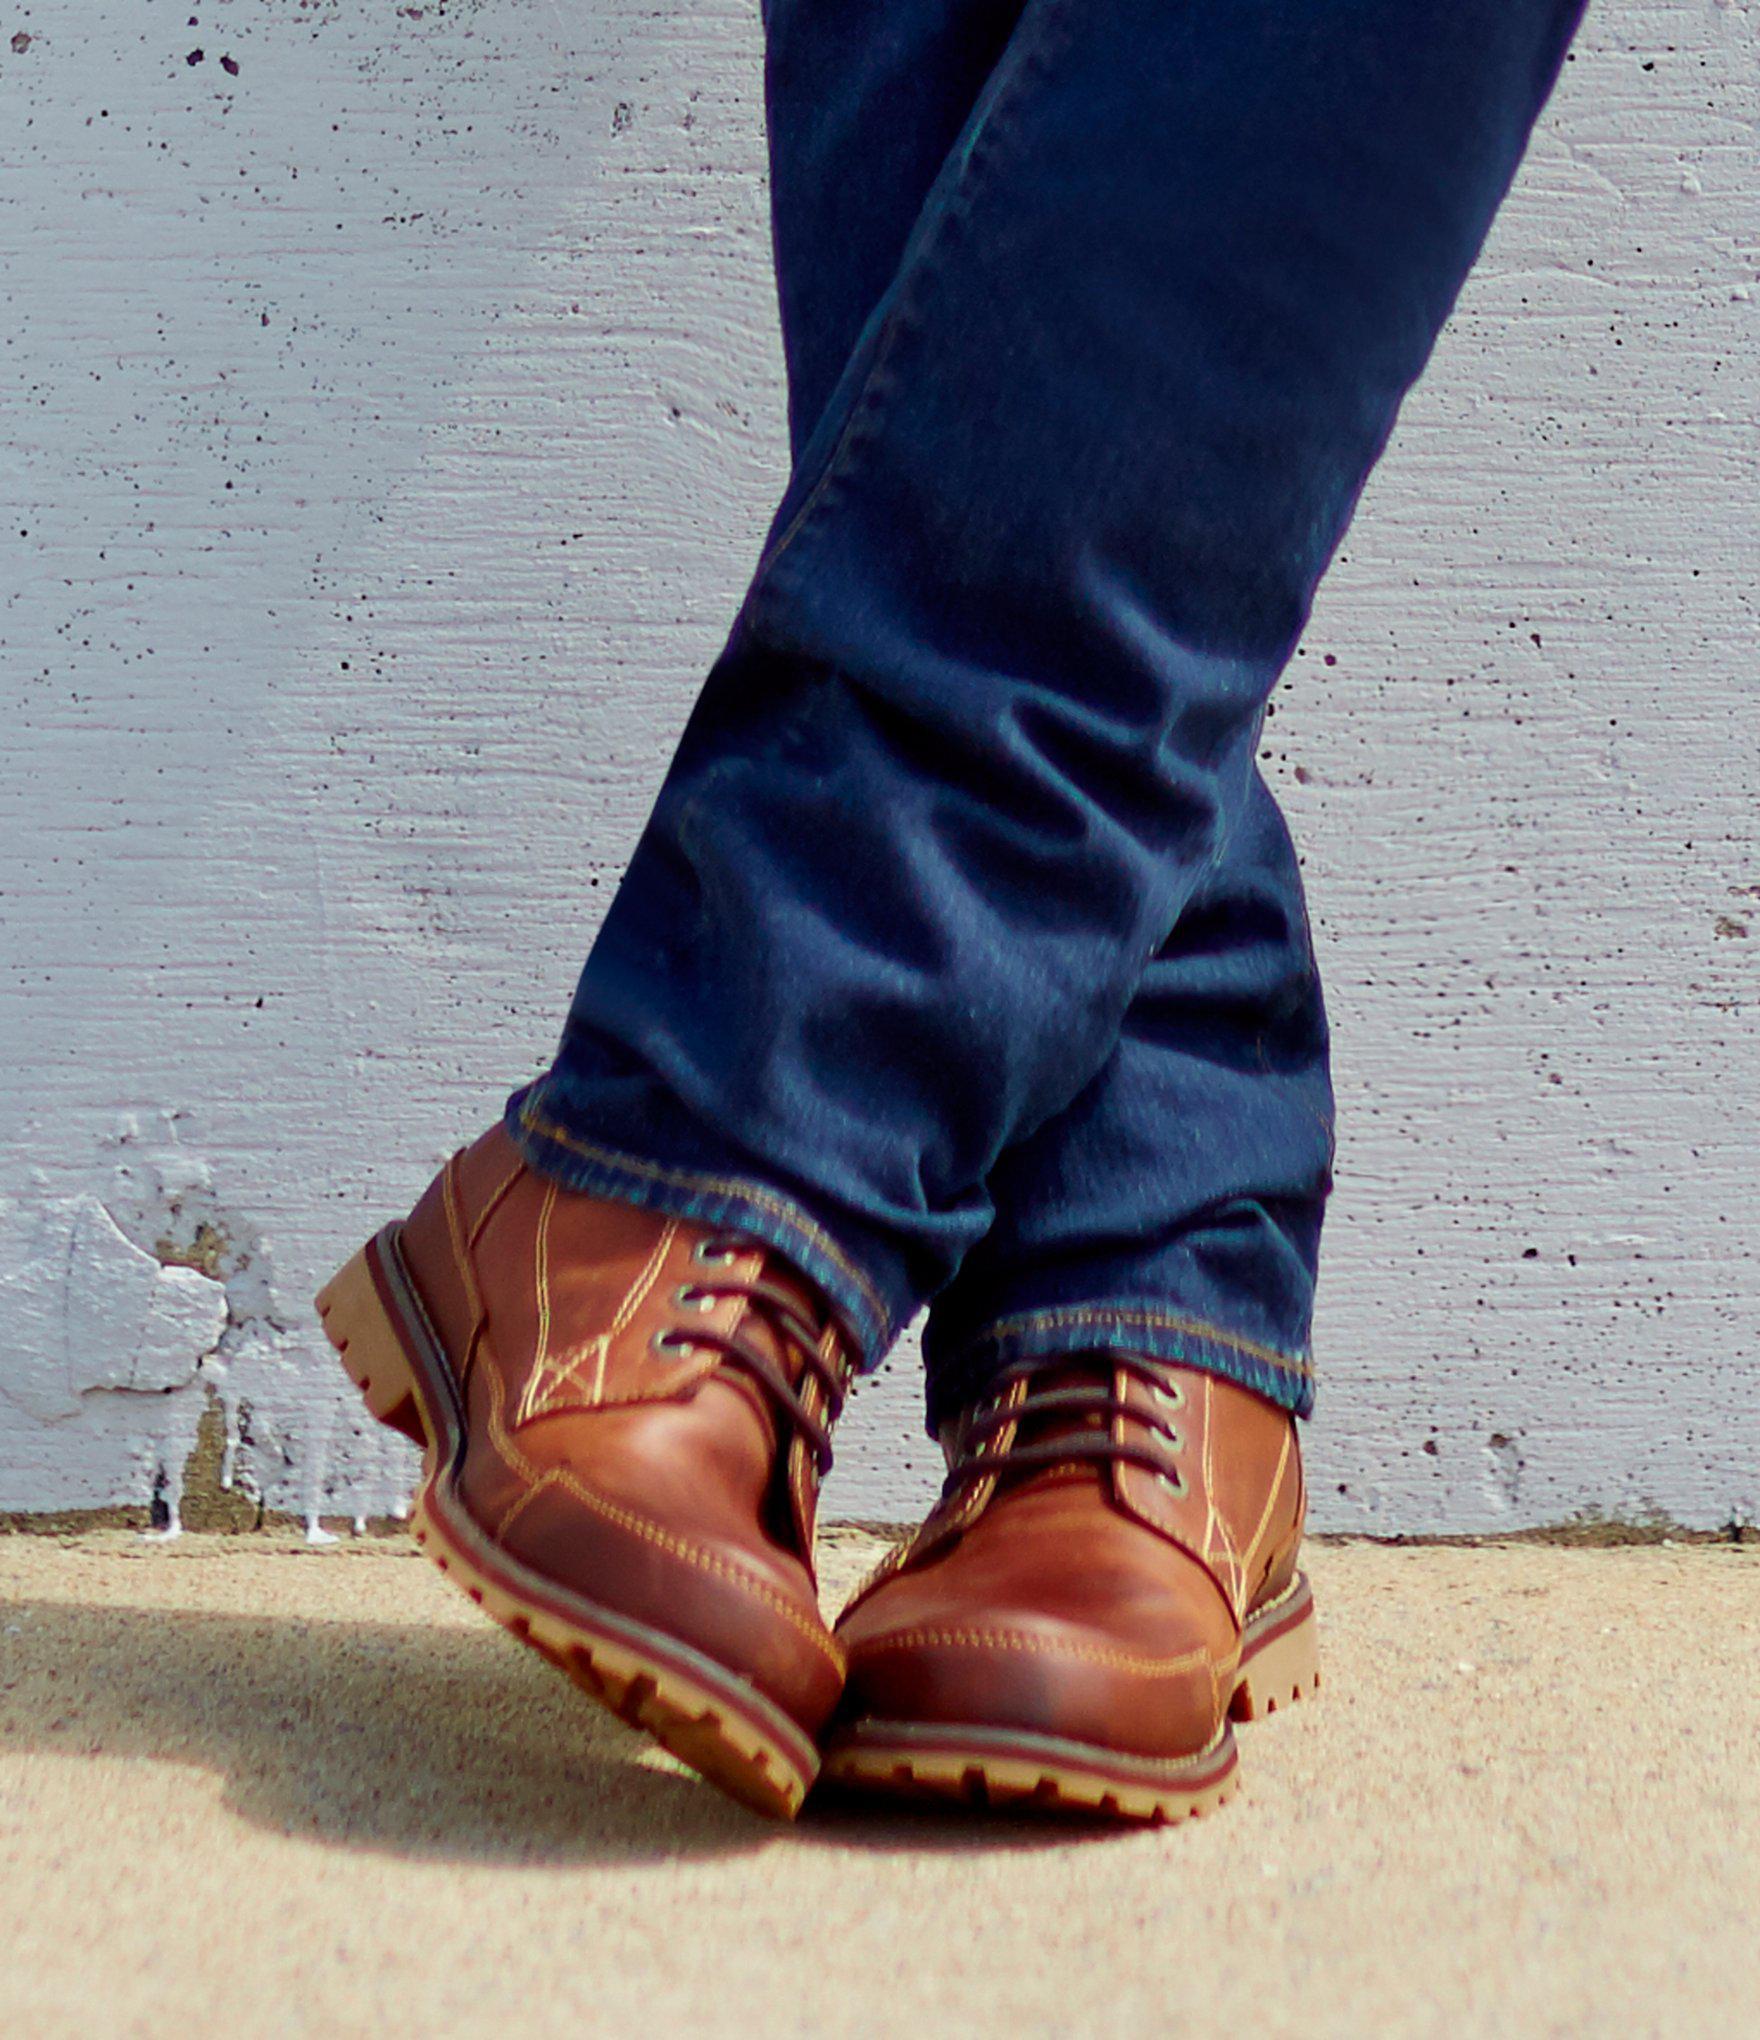 69284032c21 Men's Brown Earthkeeper Waterproof Leather Boots